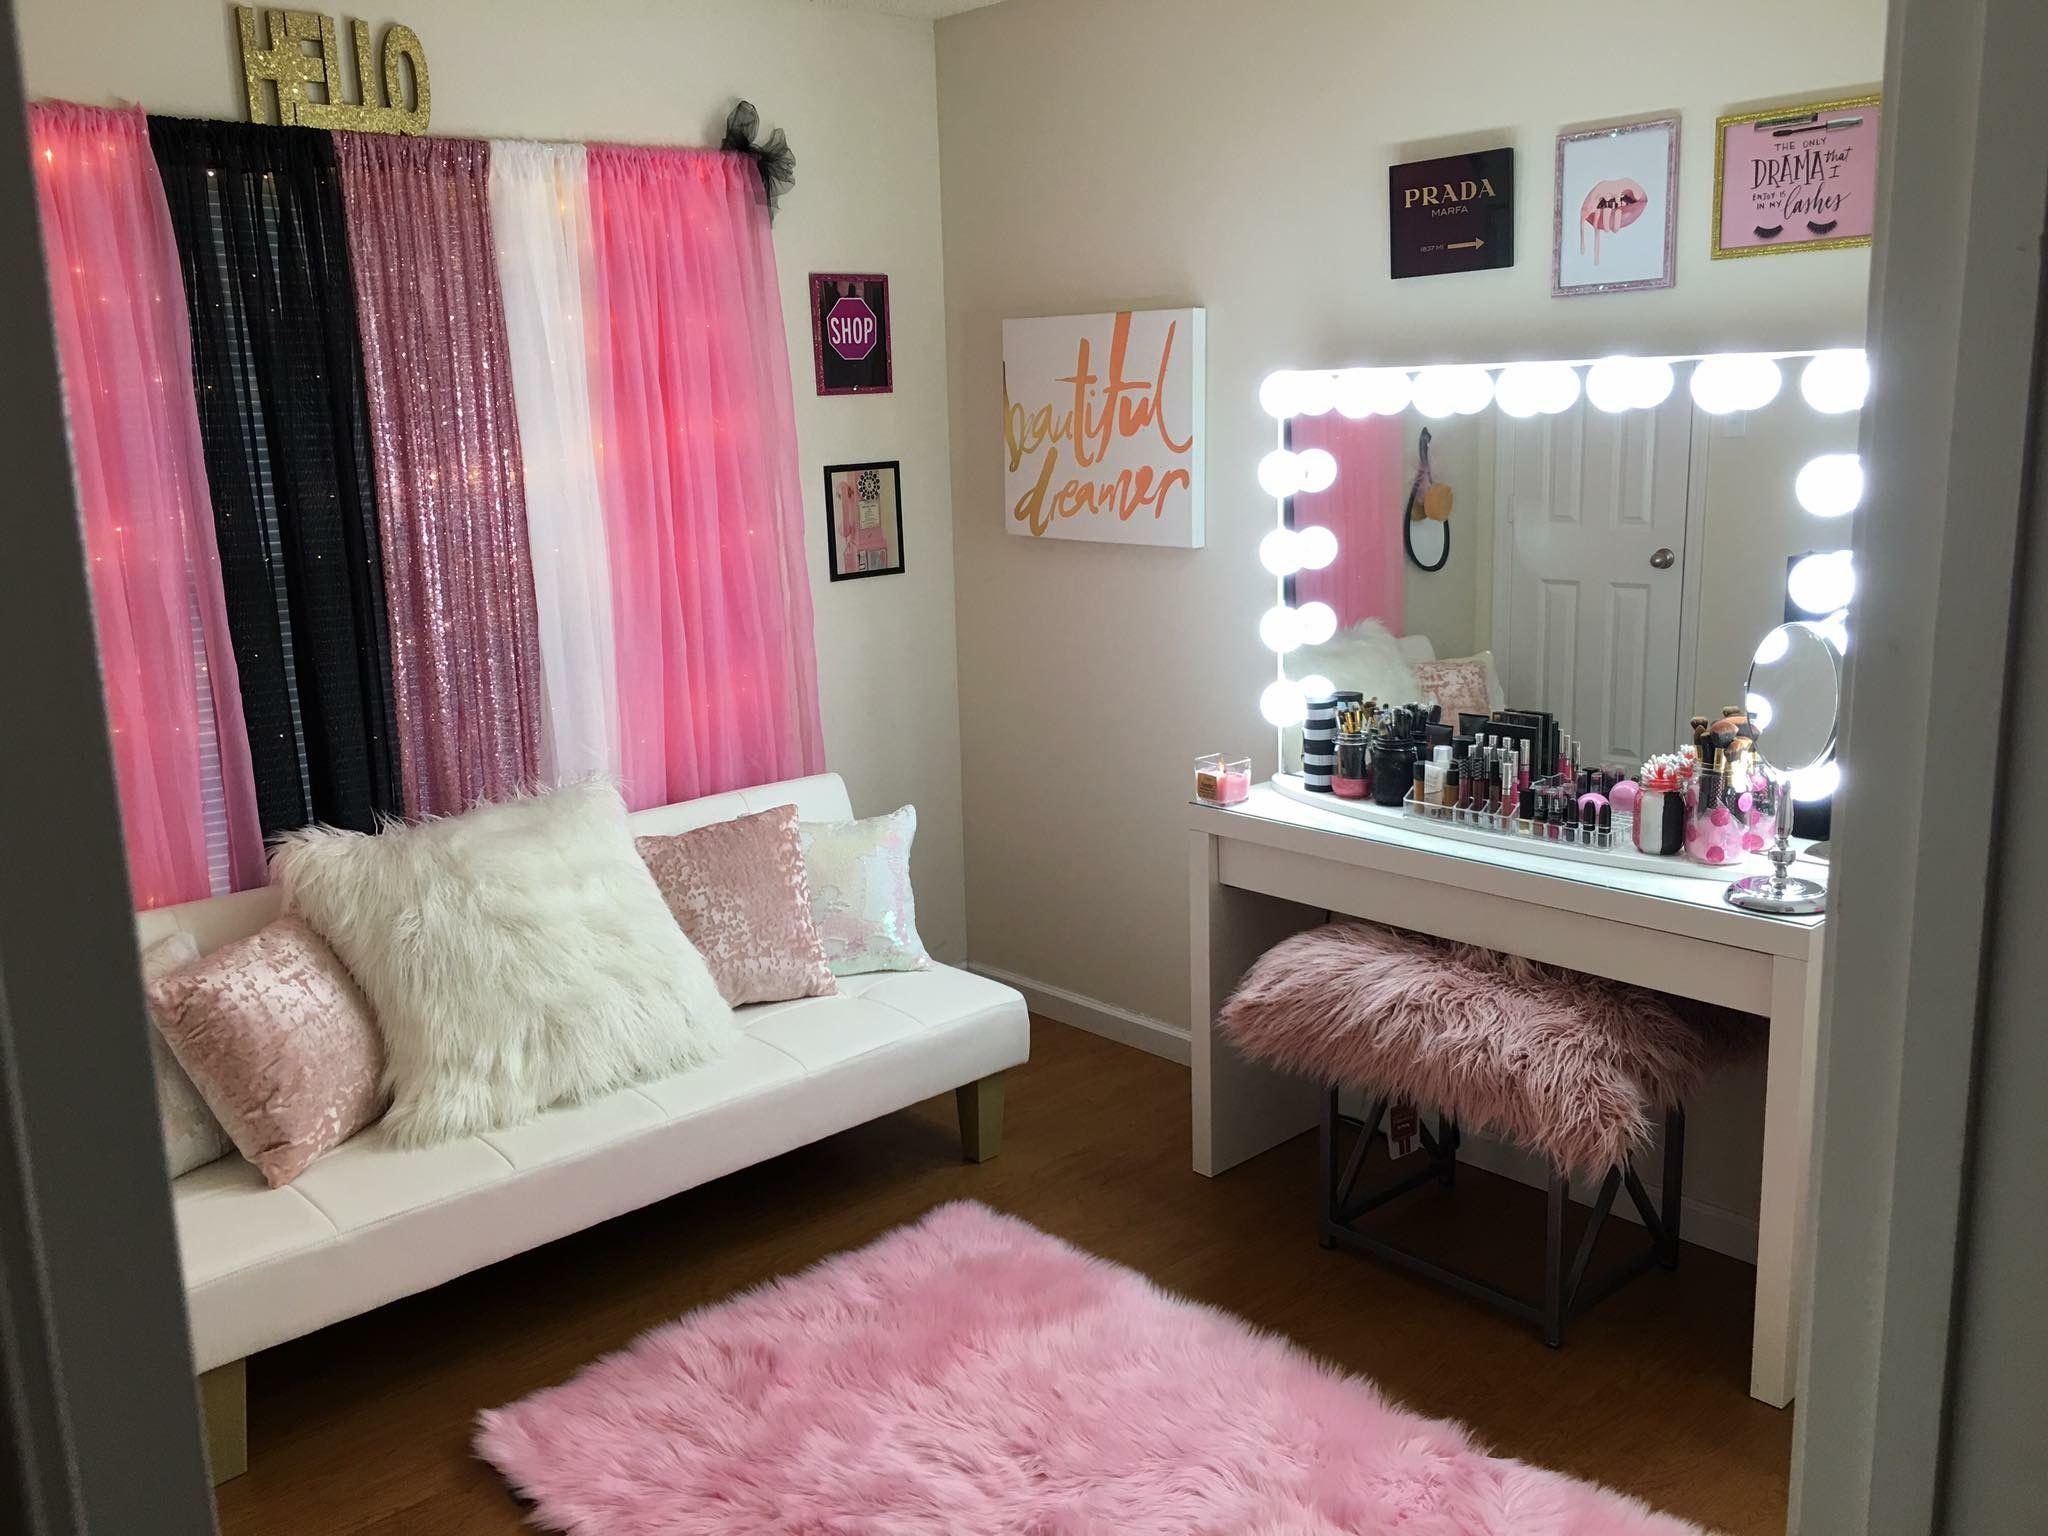 Pin de Sierra en Diva Glam Decor Ideas   Pinterest   House ...